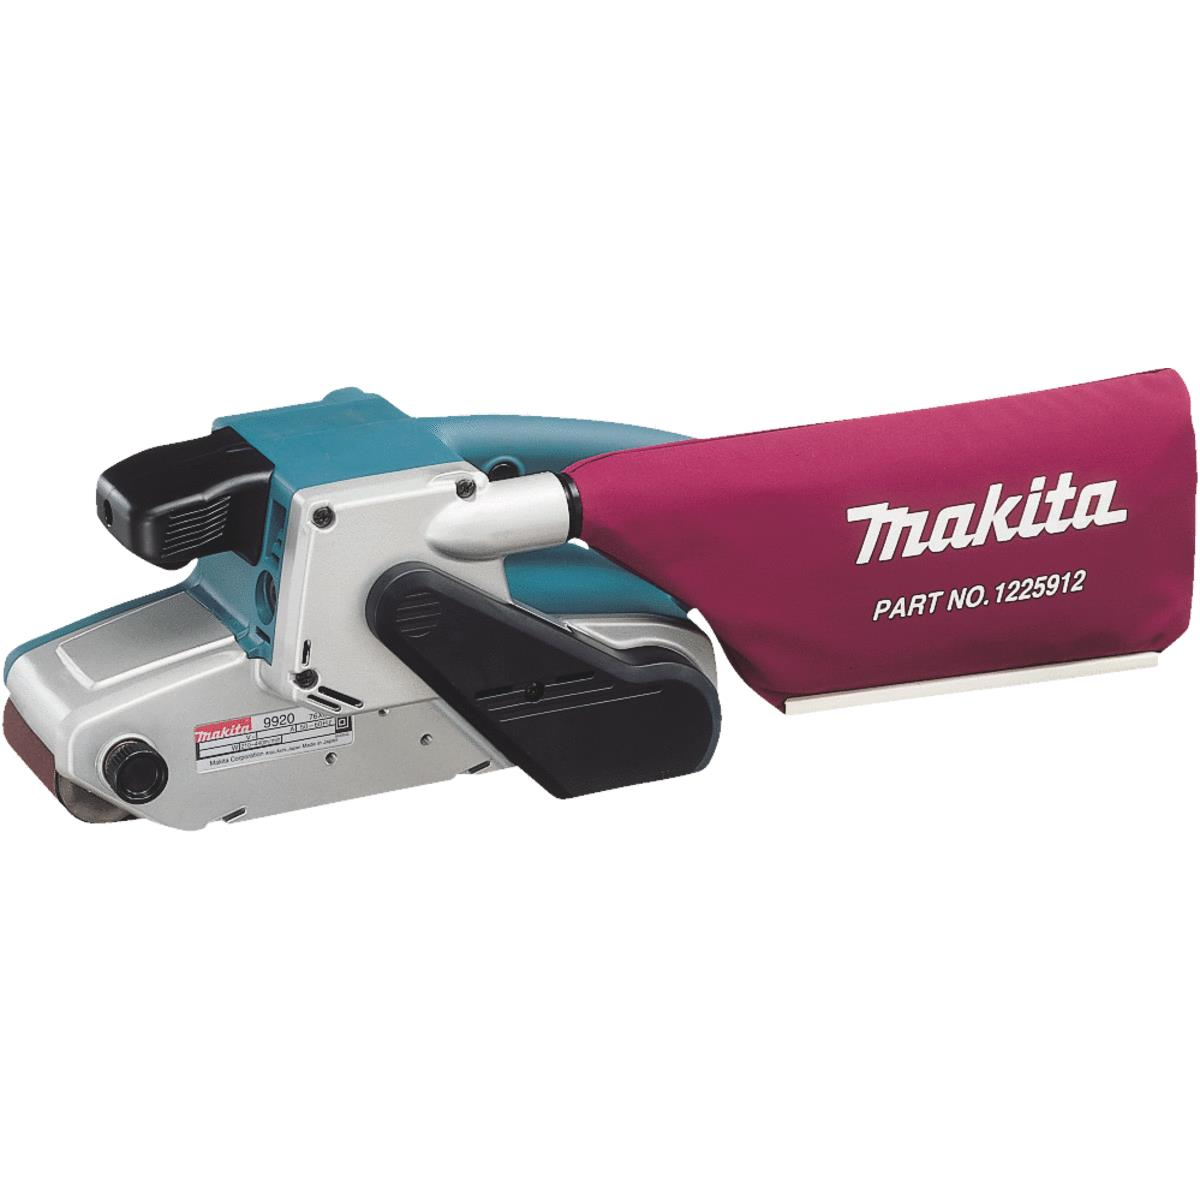 Makita 3 x 24 Belt Sander